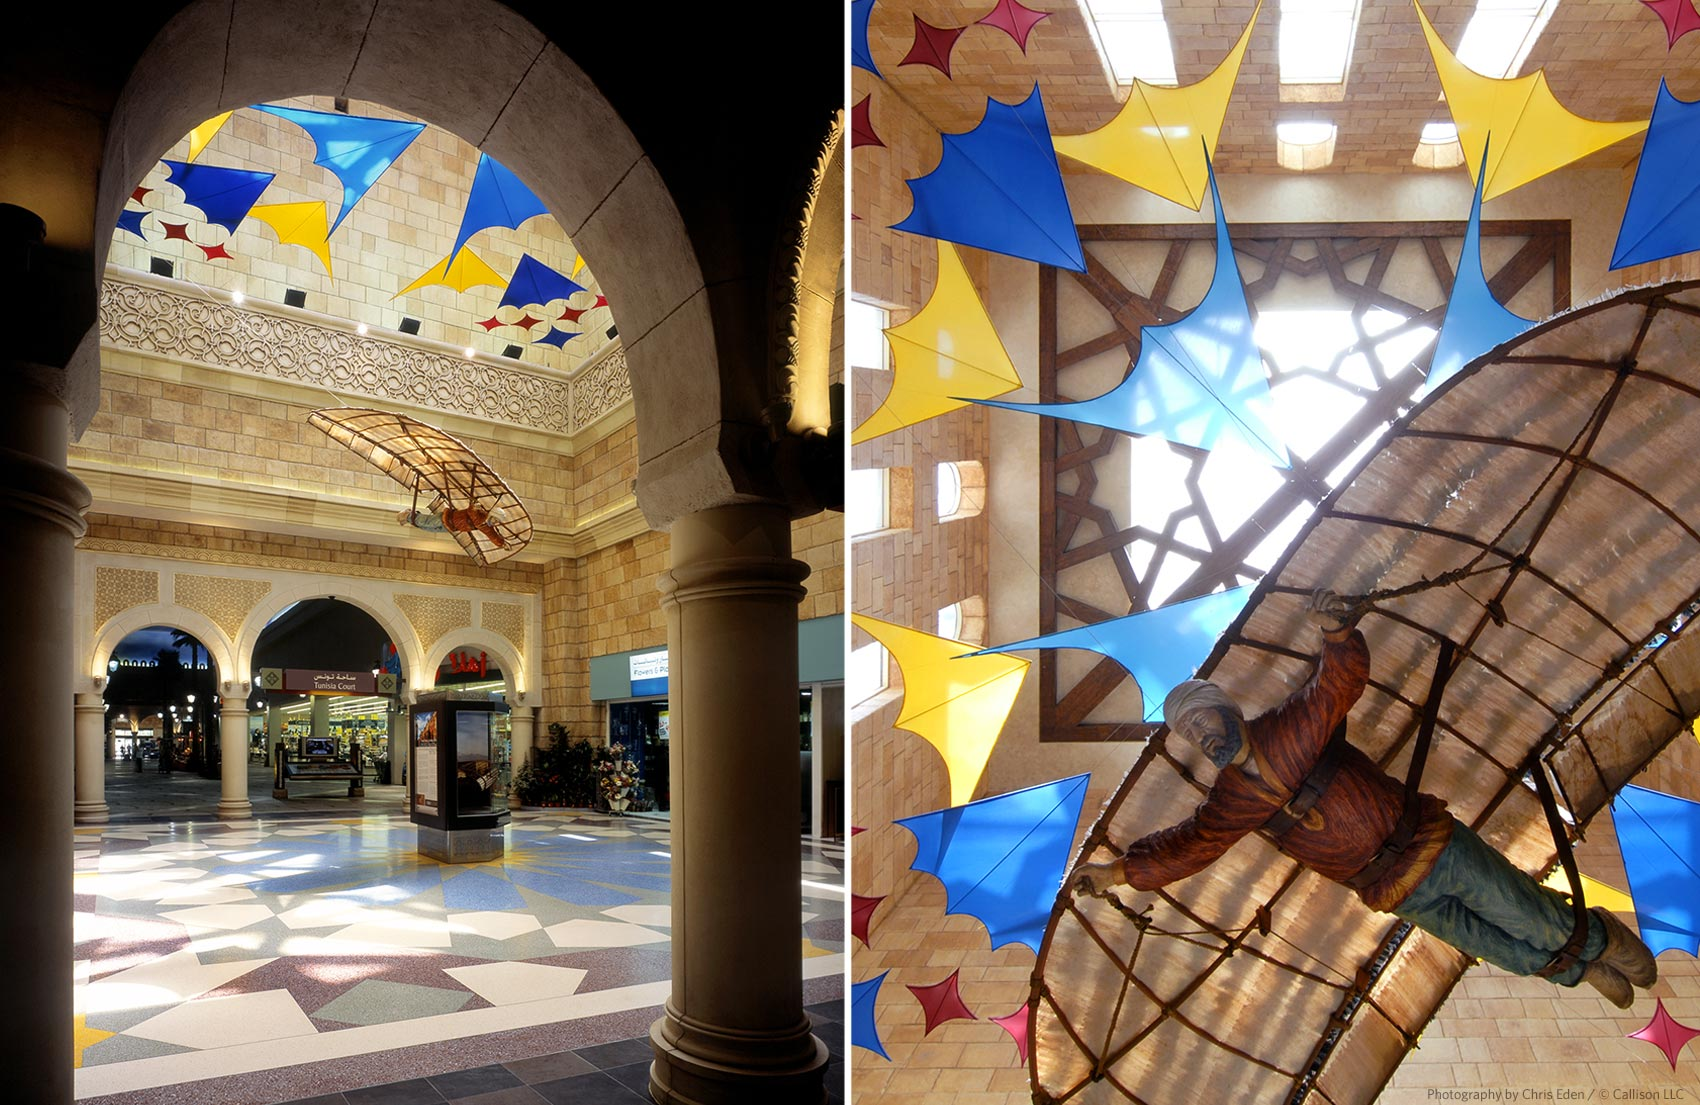 Ibn Buttuta Center - Dubai - Key interior details